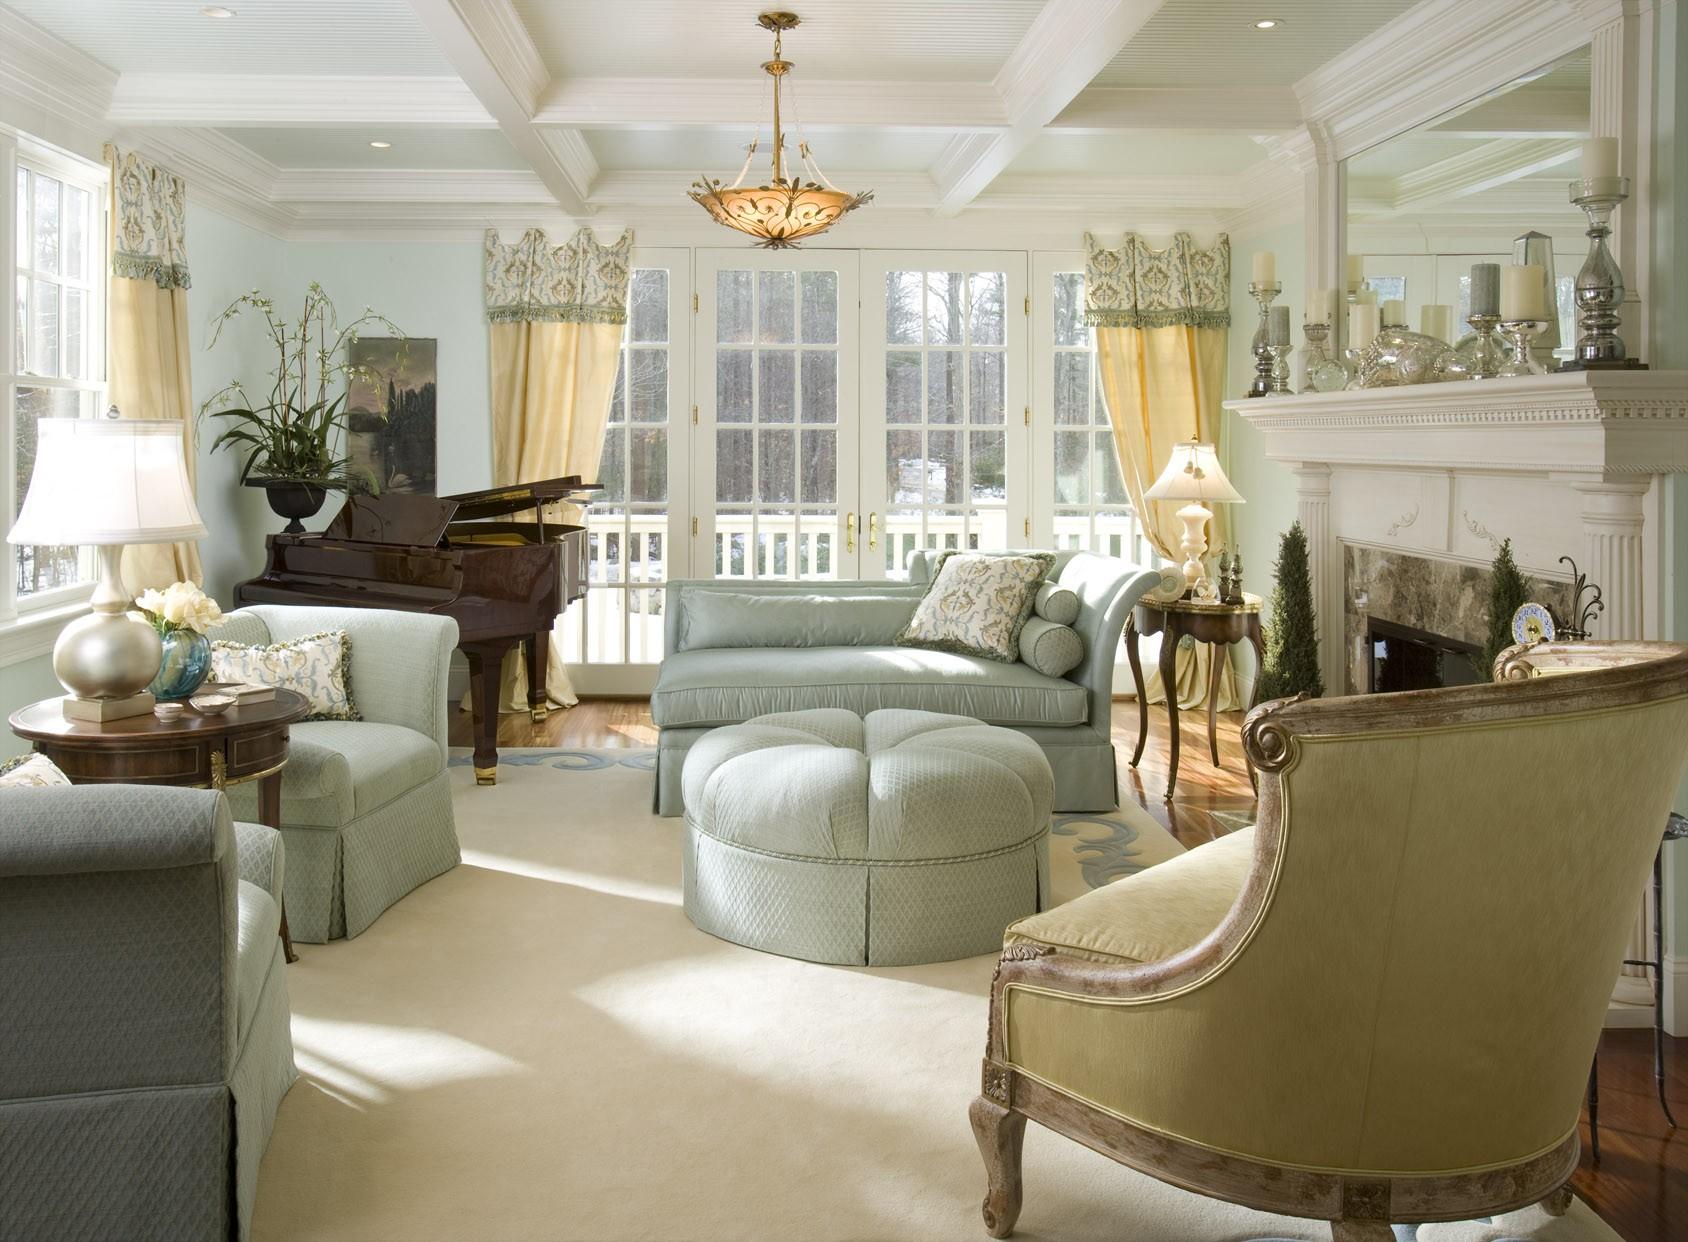 Luxury Ideas For Lavish Living Room Style: Oturma Odanızda Fransız Stili